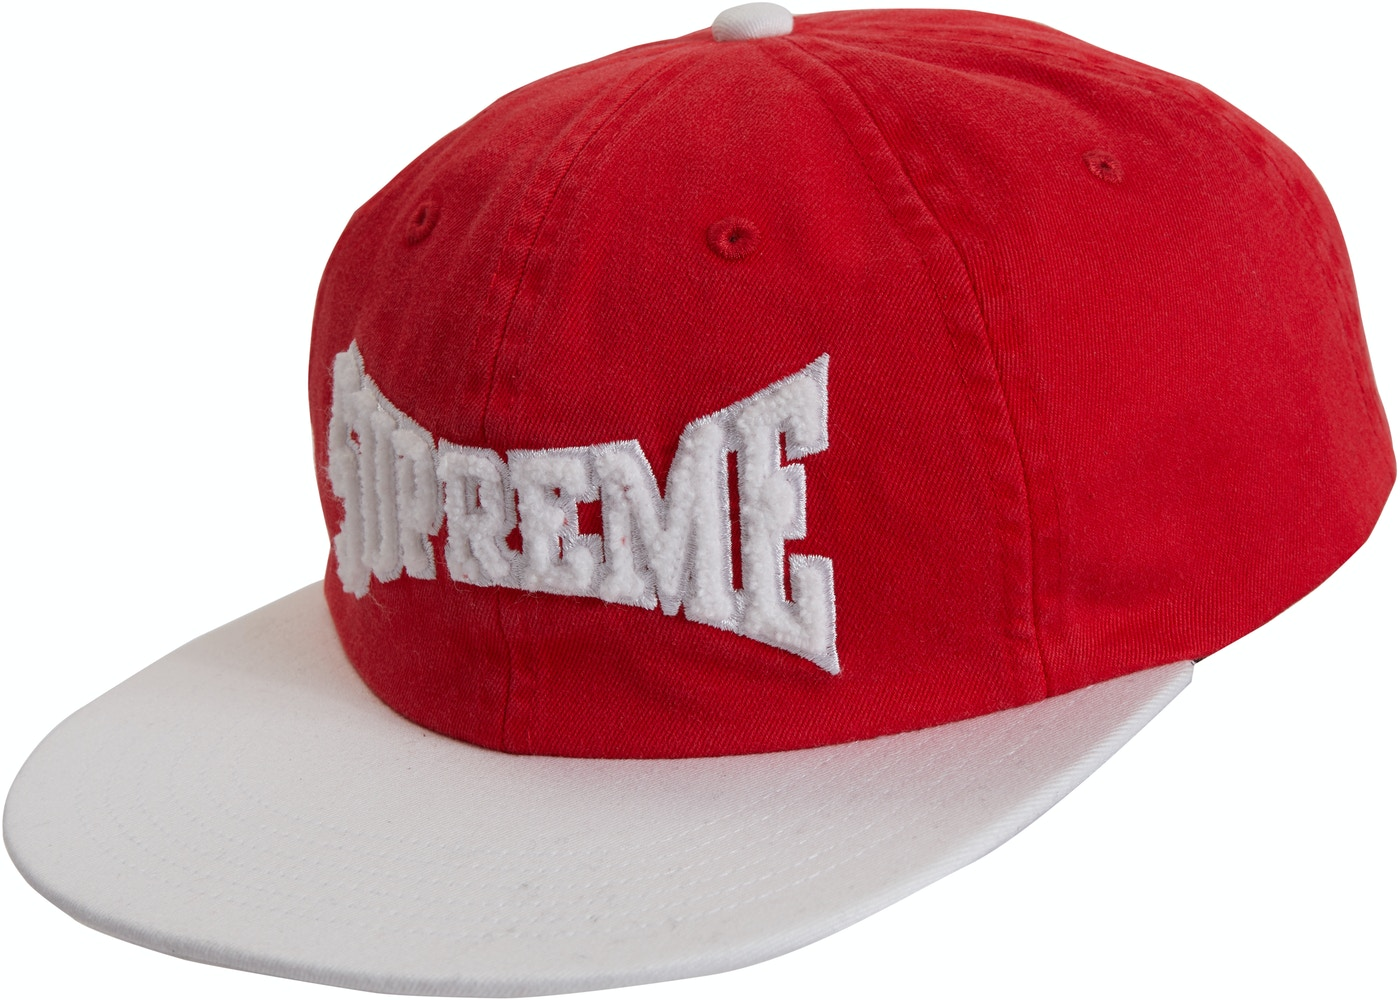 888ef39d Streetwear - Supreme Headwear - Volatility